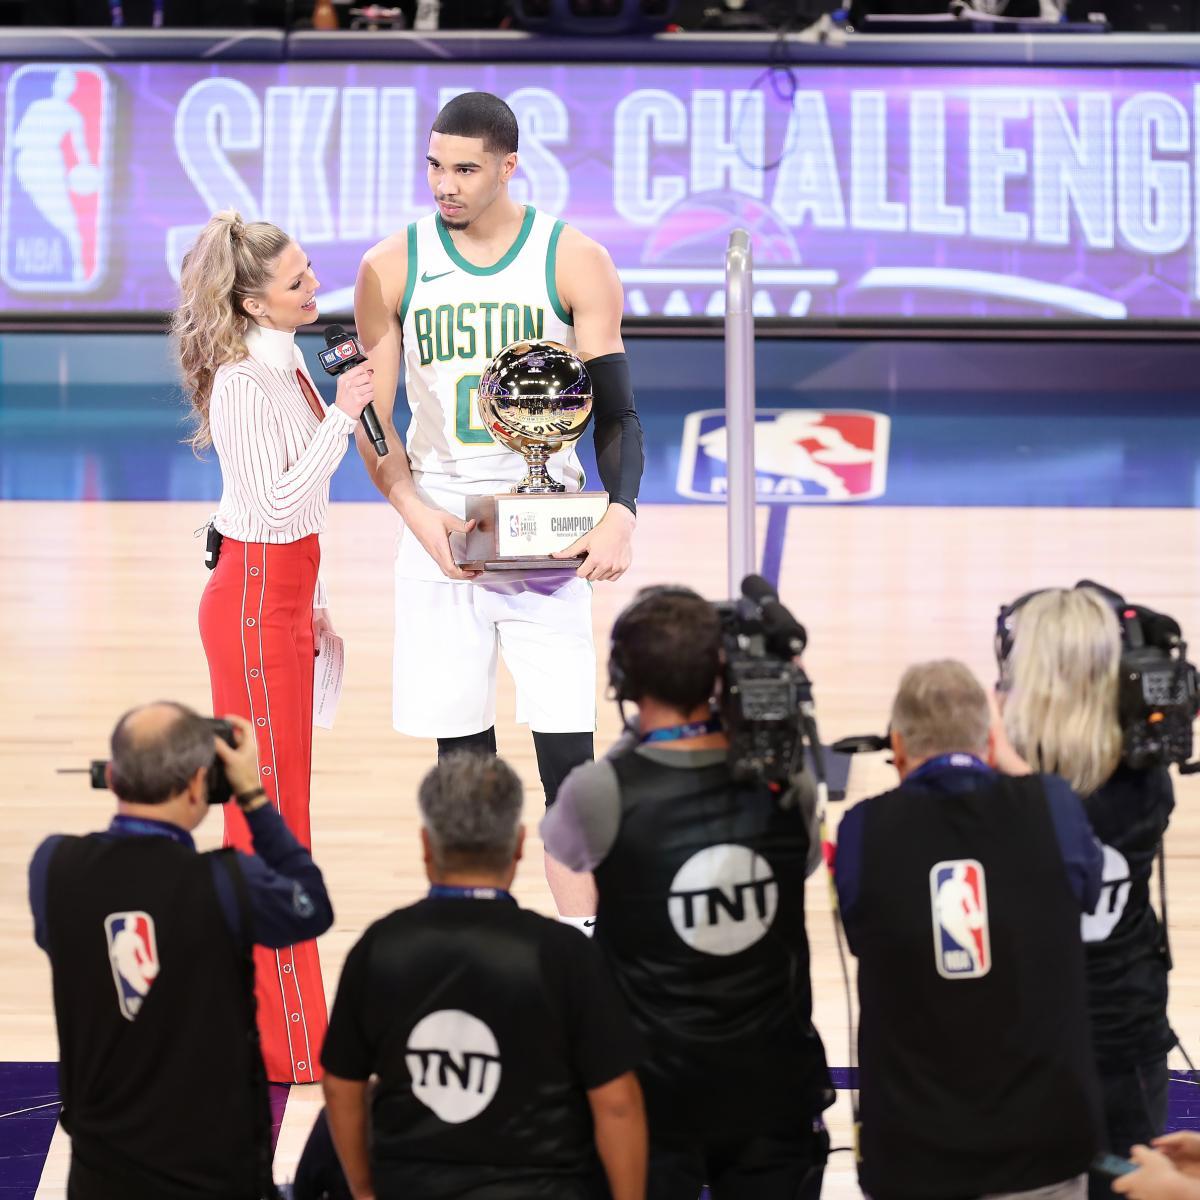 Report Luka Doncic De Aaron Fox Commit To 2019 Nba All: Jayson Tatum Wins 2019 NBA Skills Challenge: Recap